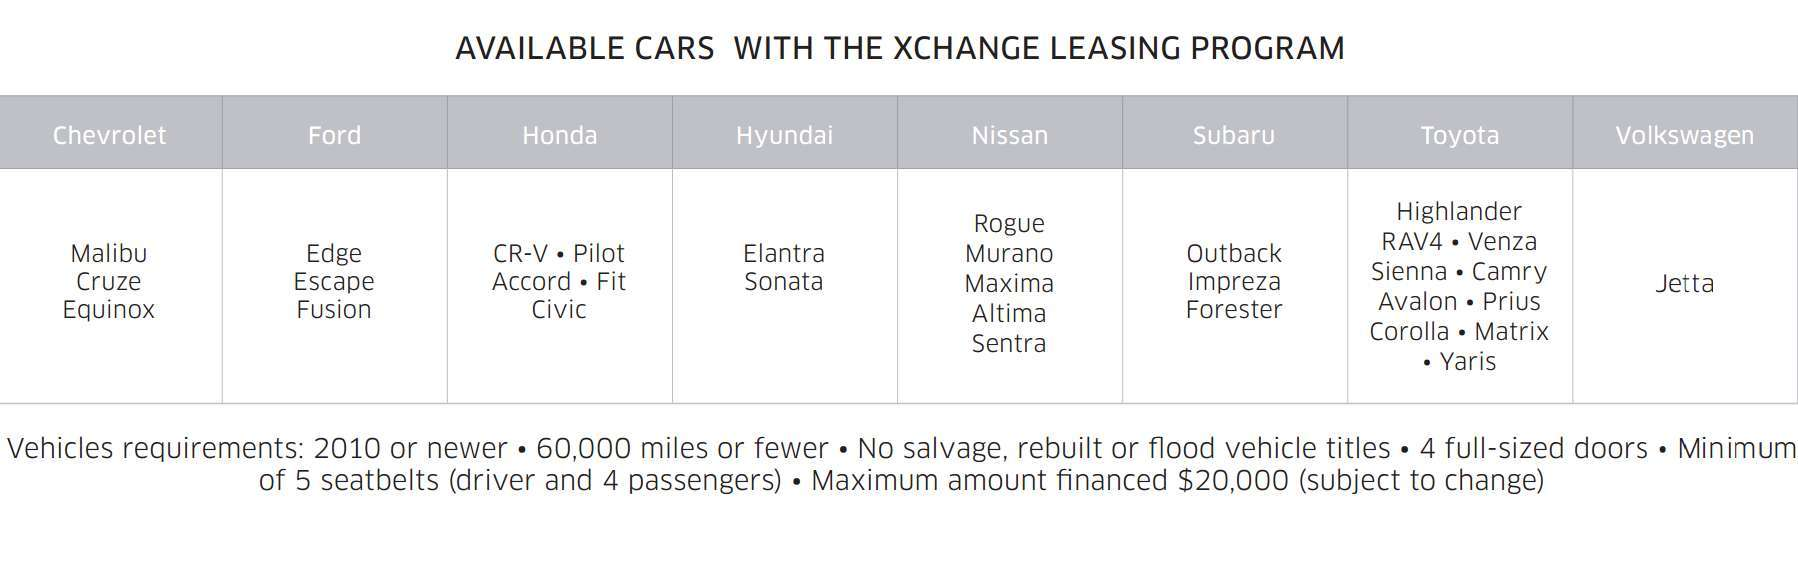 Uber Xchange Leasing Program: A Game Changer